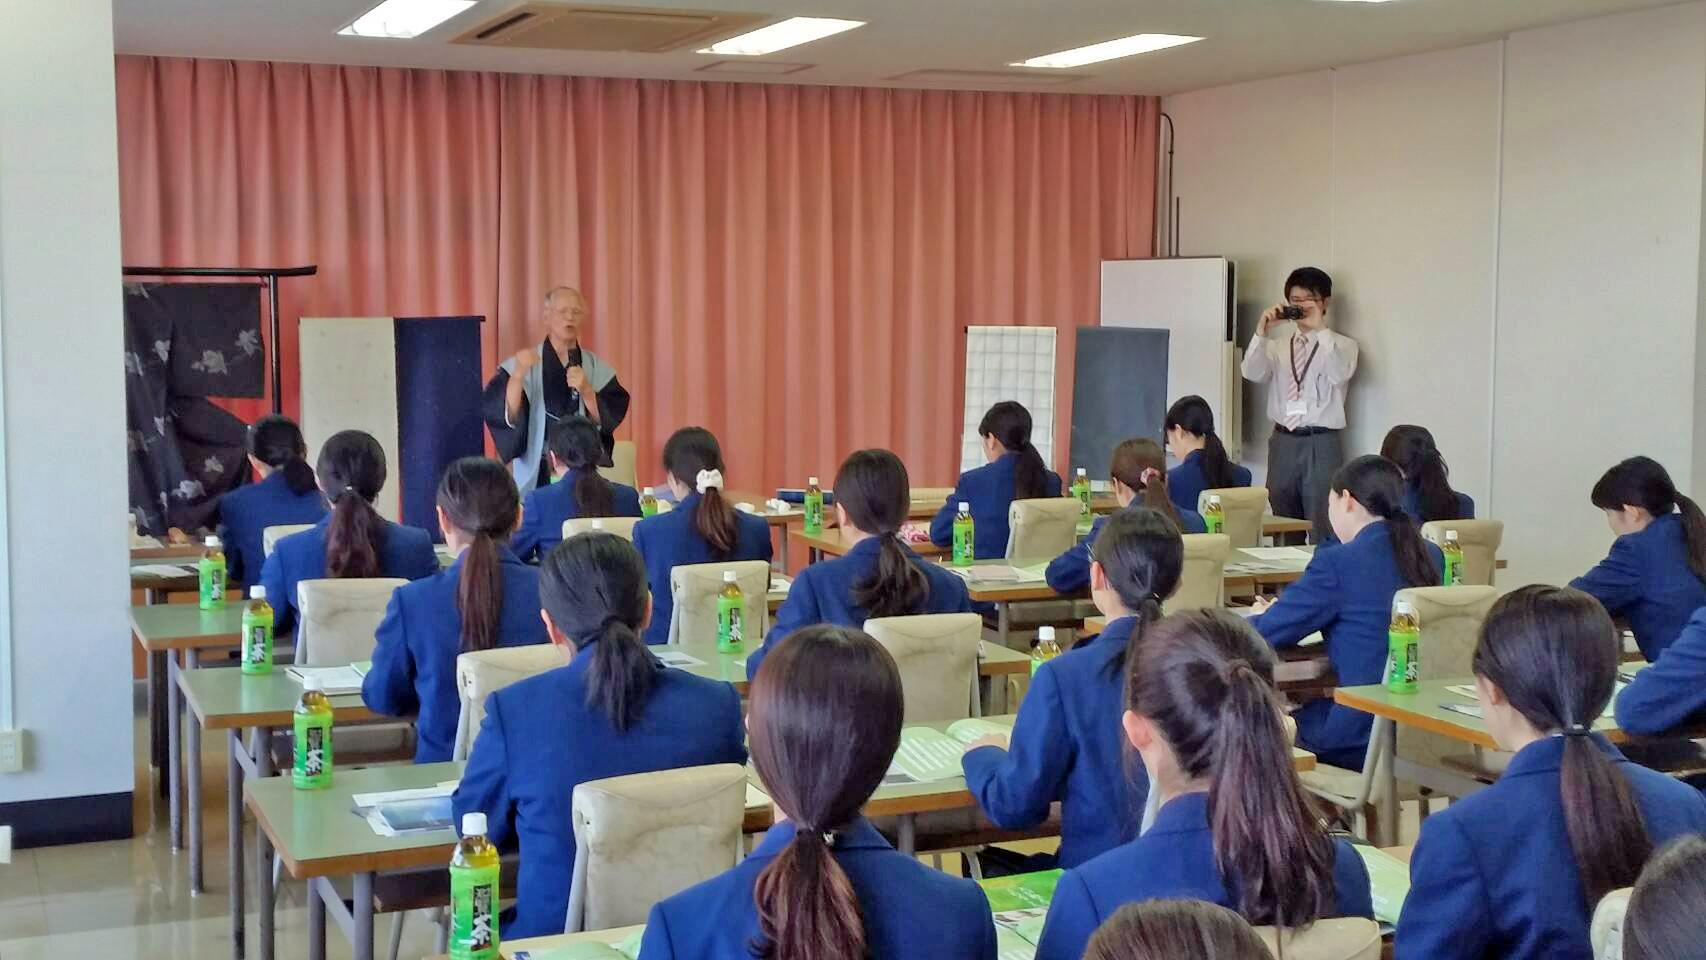 鹿児島純短への工芸士派遣授業/御報告_e0194629_9473548.jpg